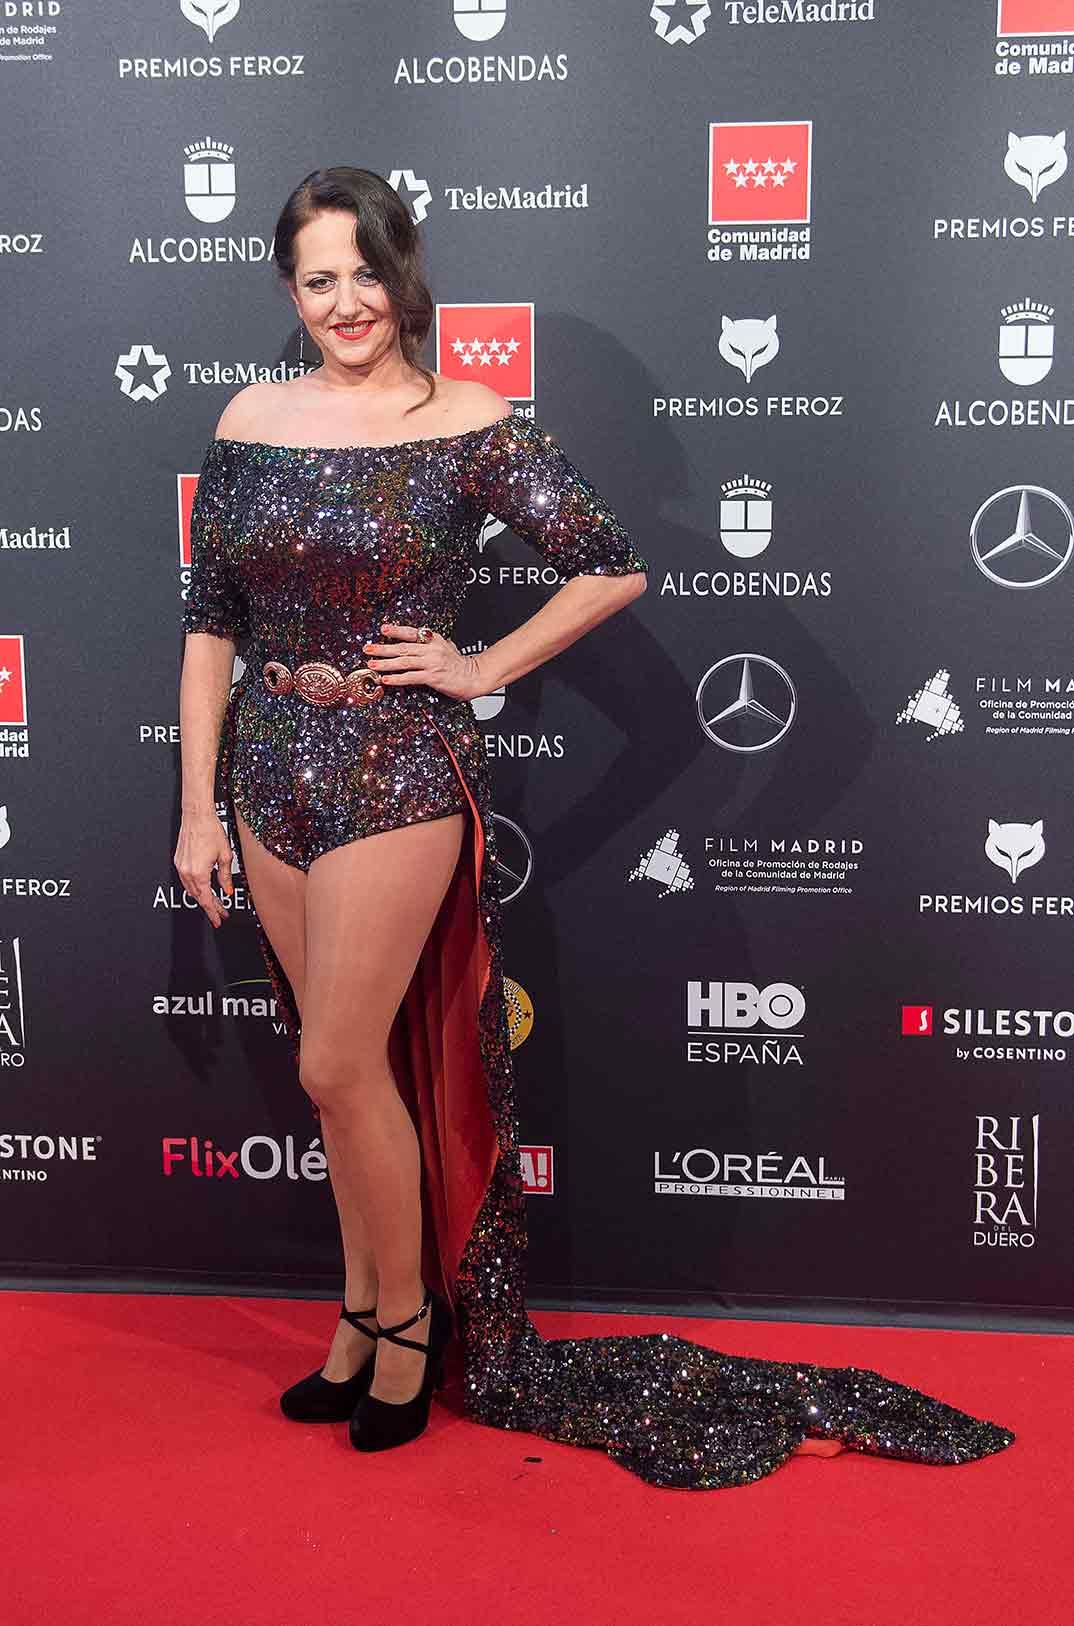 Yolanda Ramos - Premios Feroz 2020